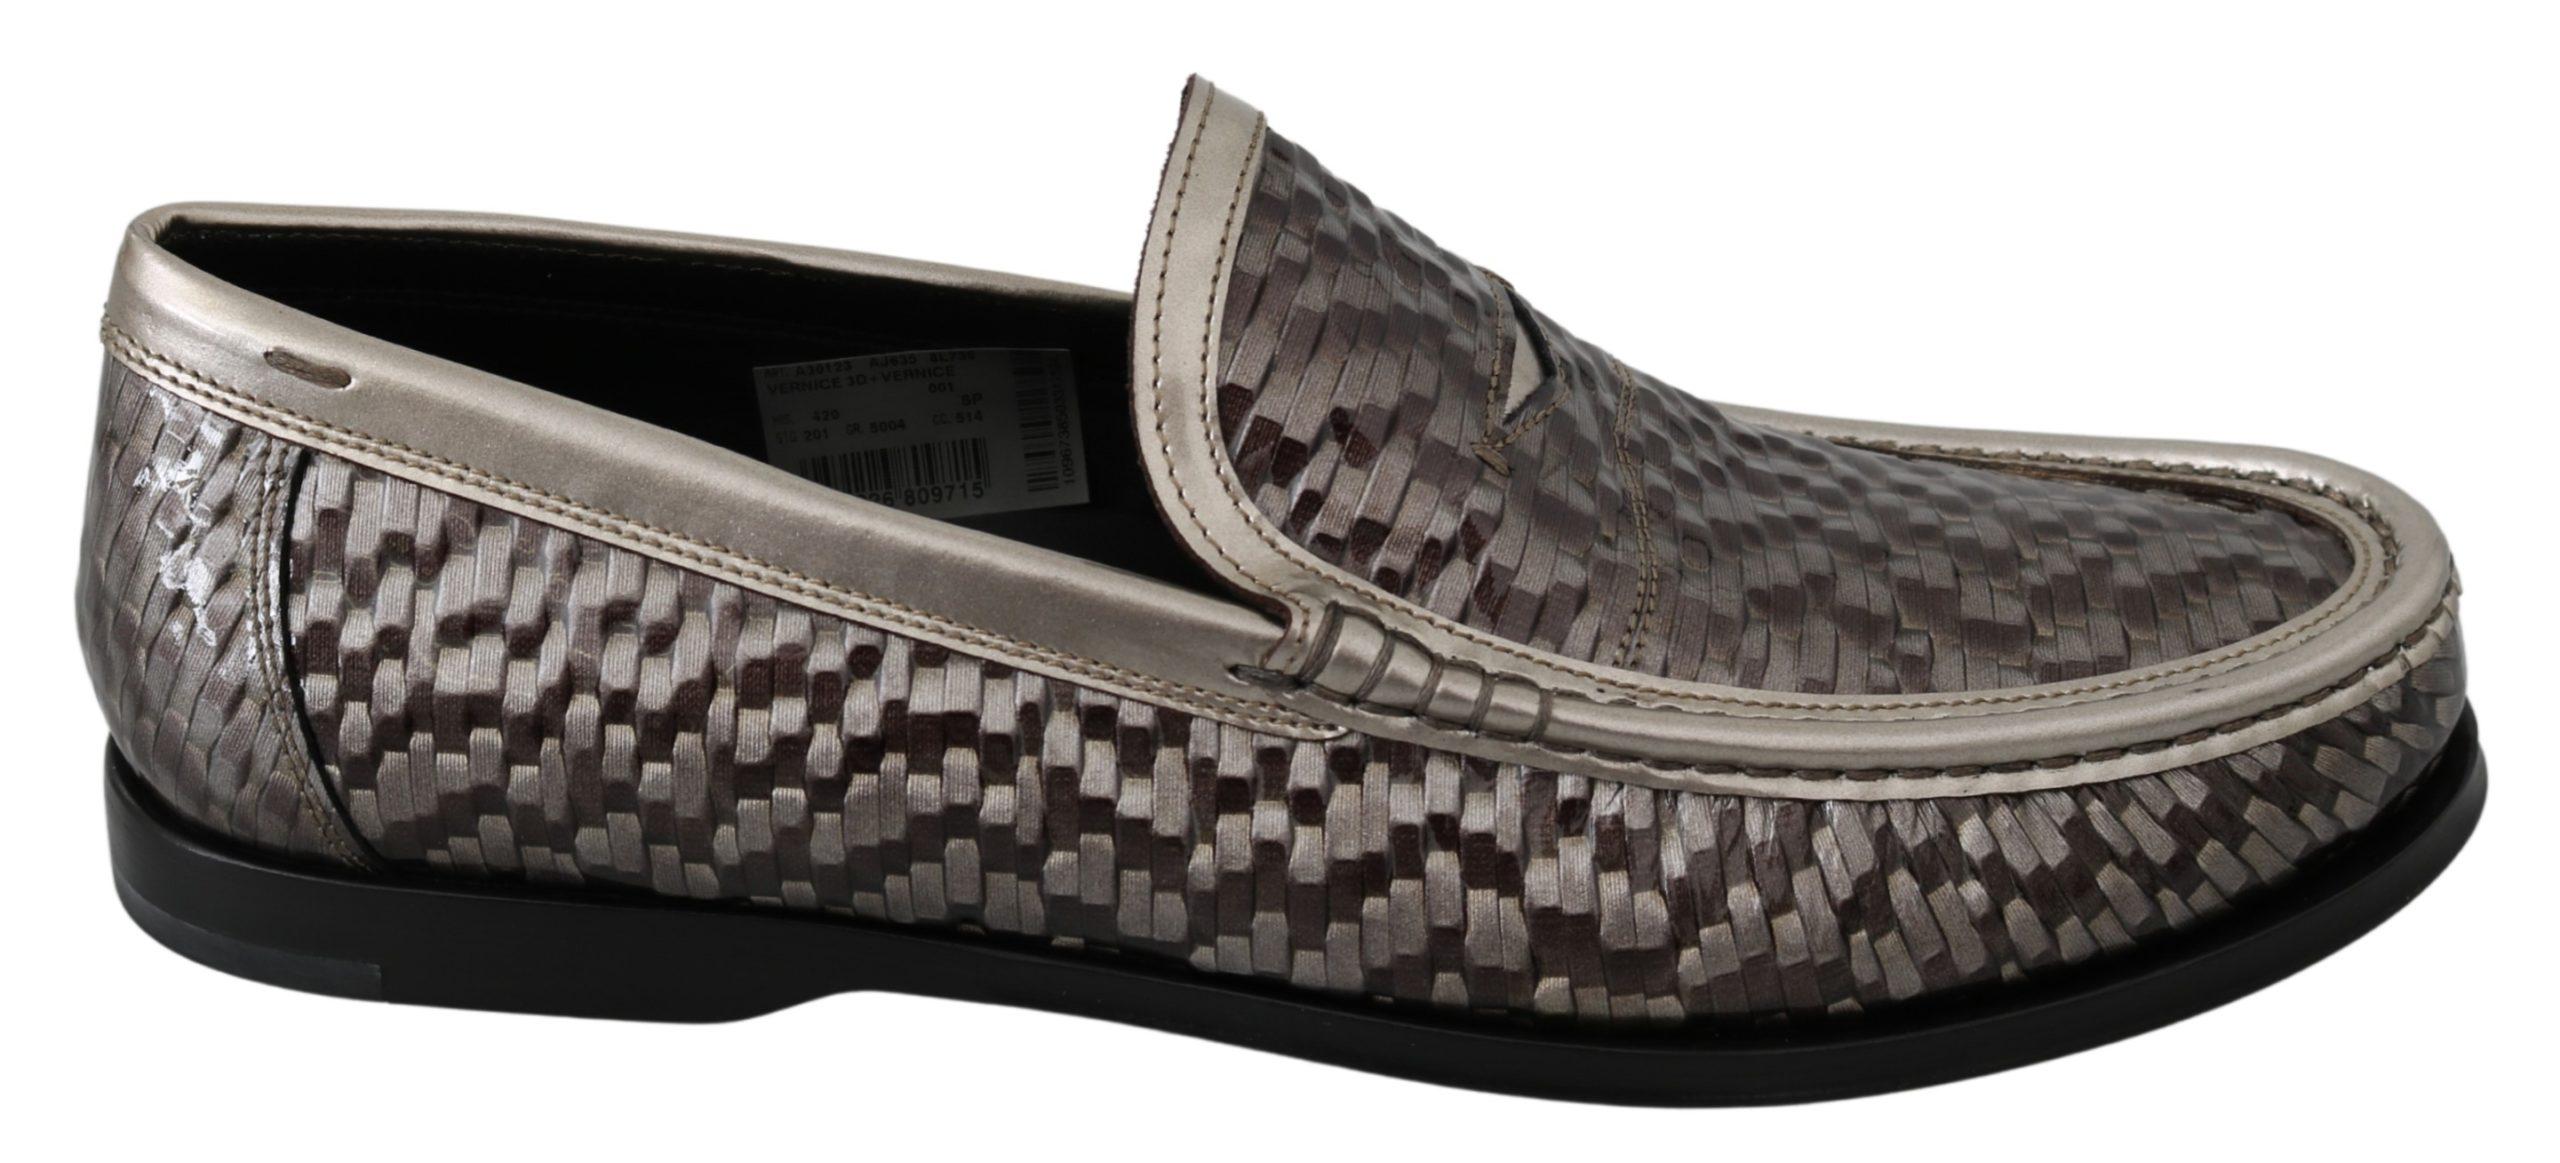 Dolce & Gabbana Men's Leather Woven Loafer Brown MV3038 - EU42/US9